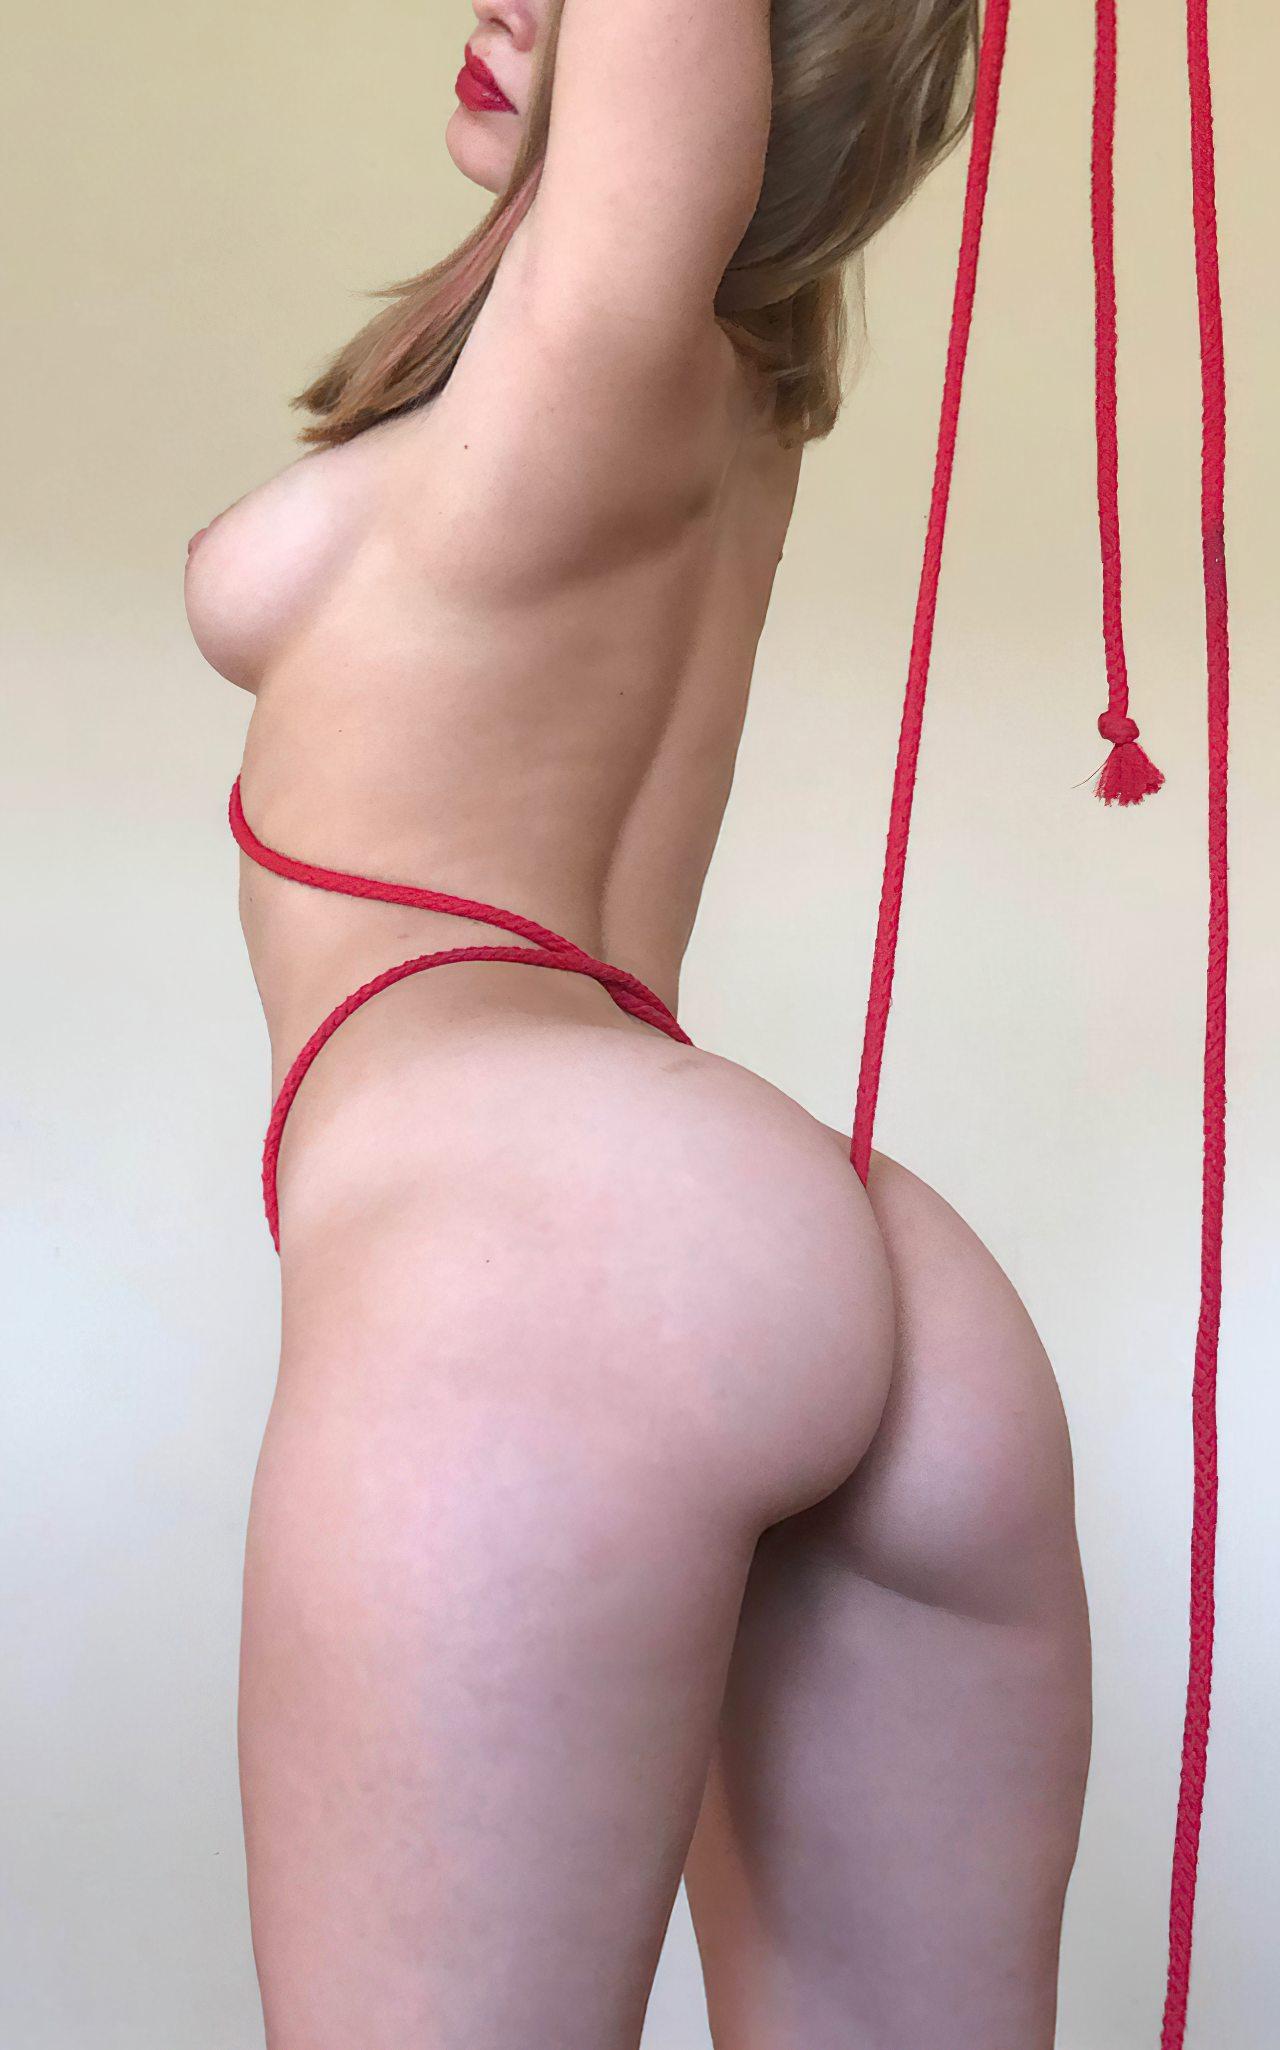 Mulher Experiente Pelada (19)